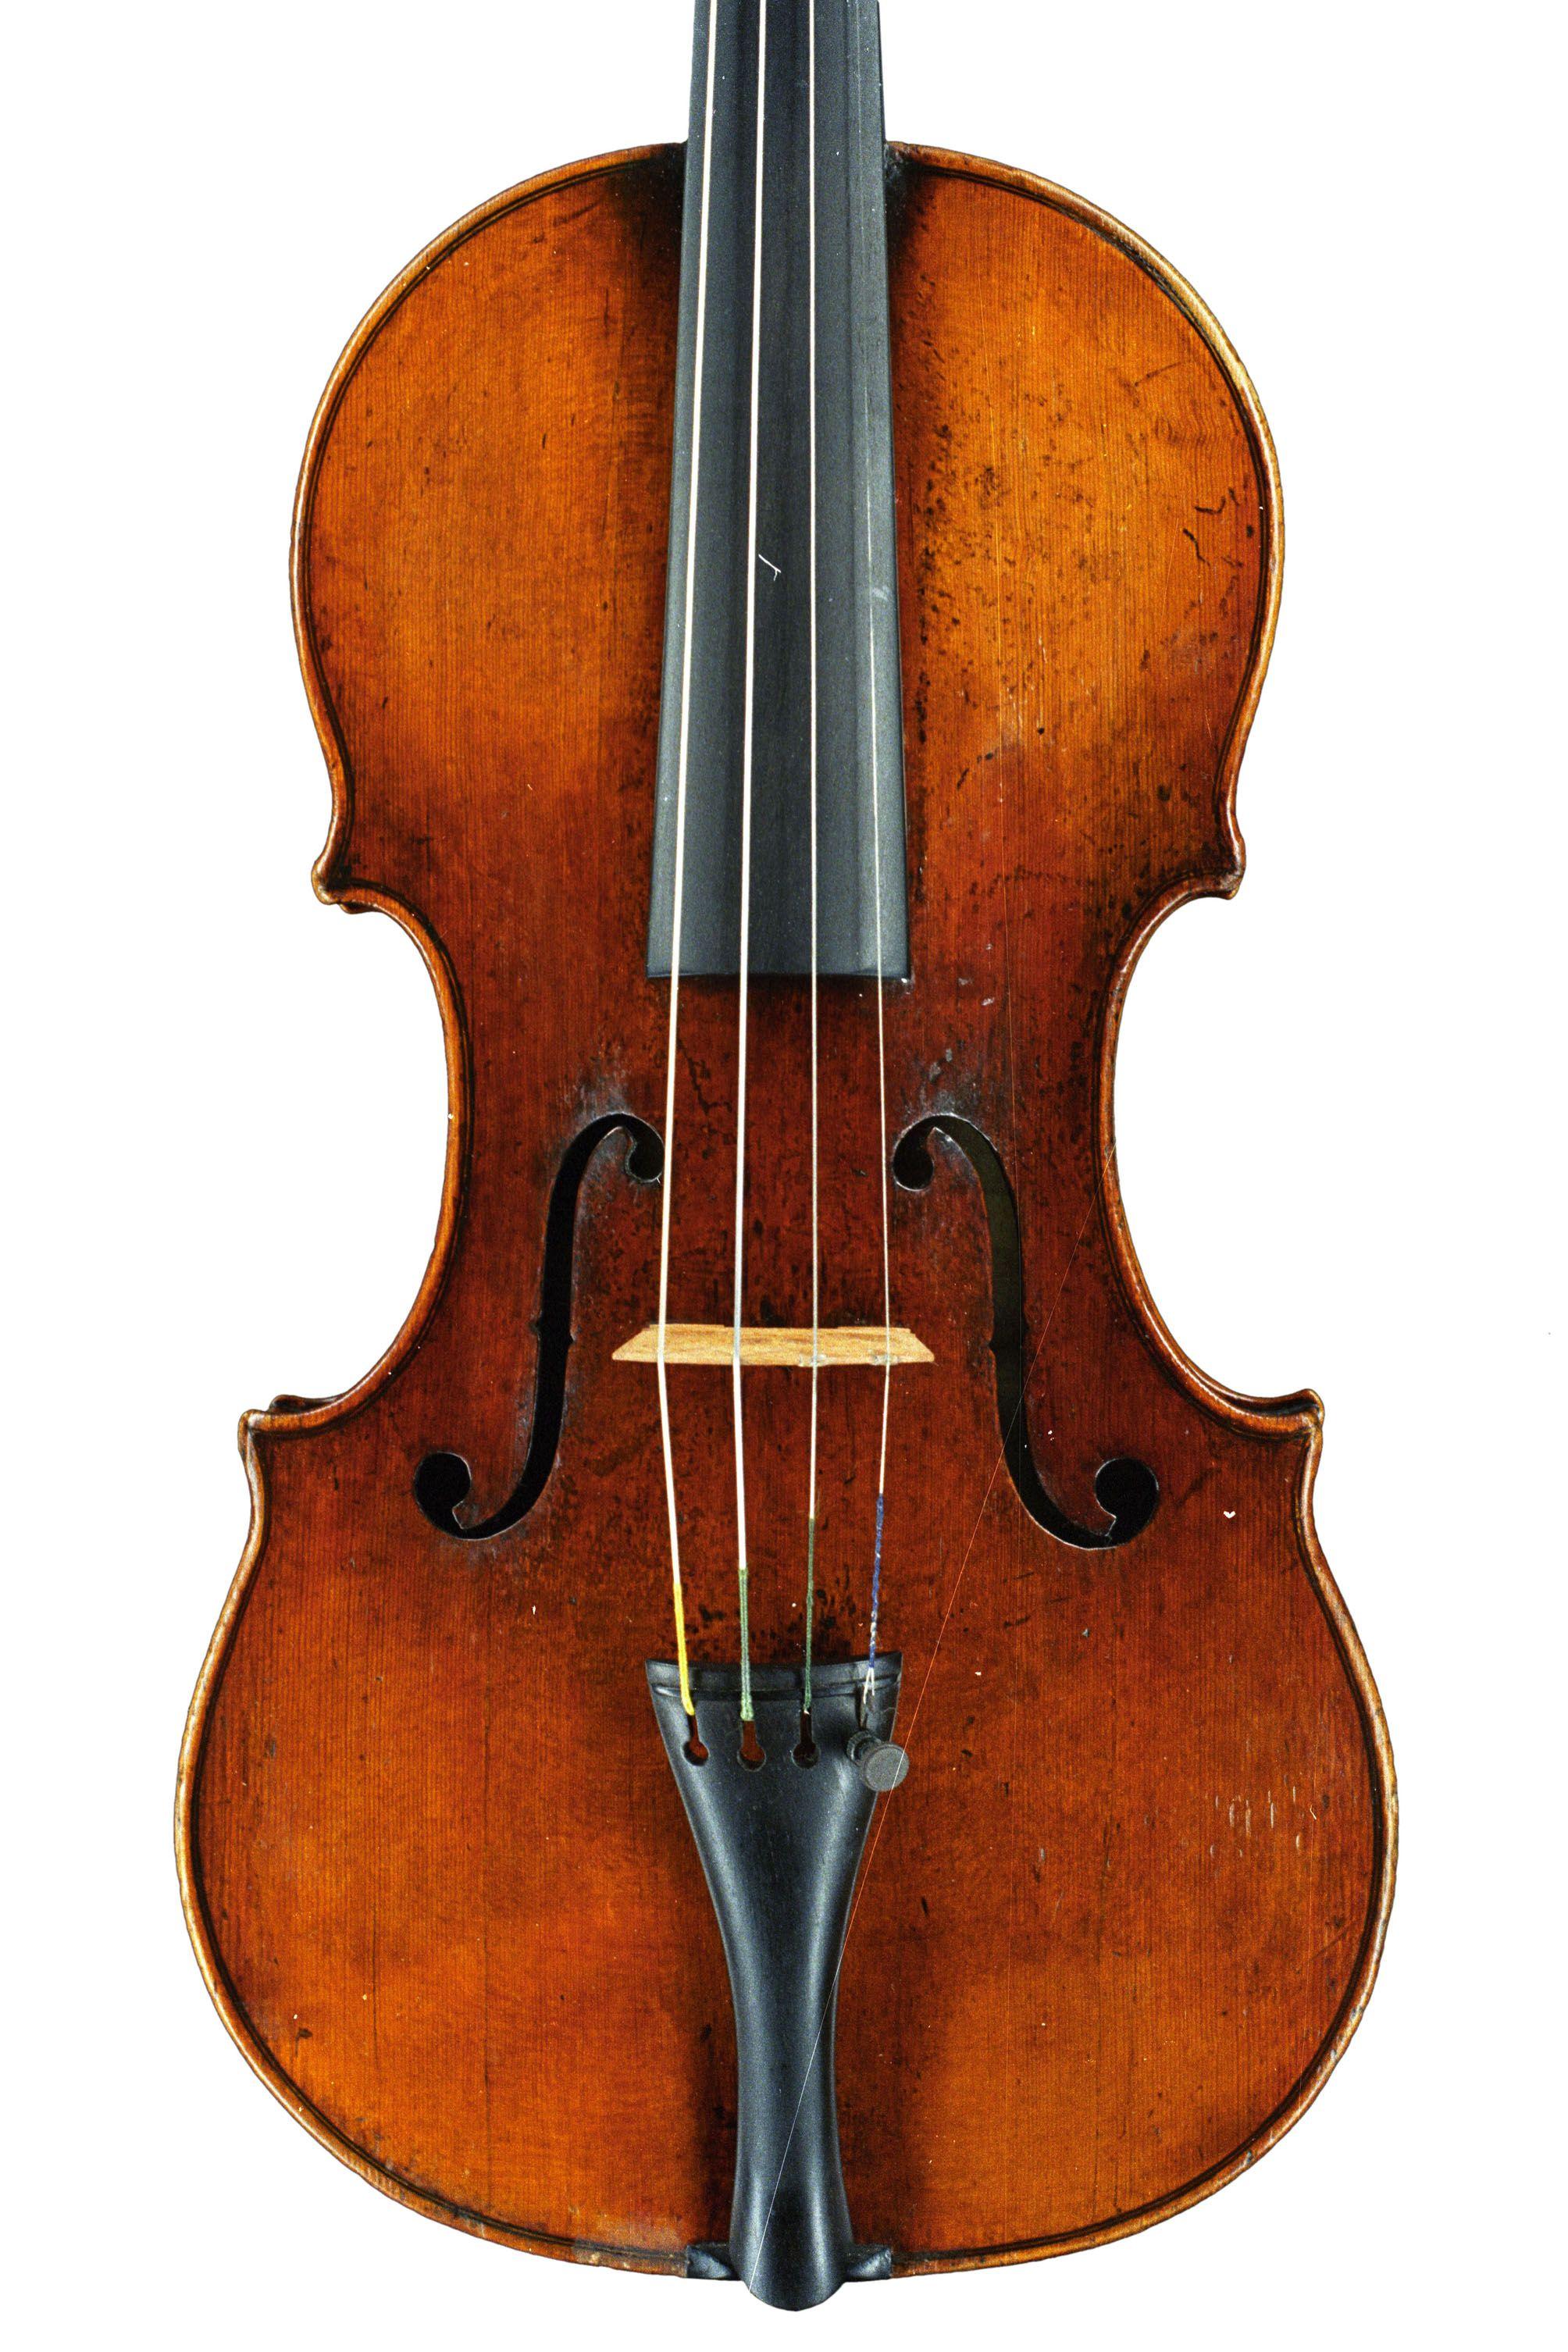 Amati Hieronymus The Second Cremona 1690 Stradivarius Violin Violin Violin Instrument